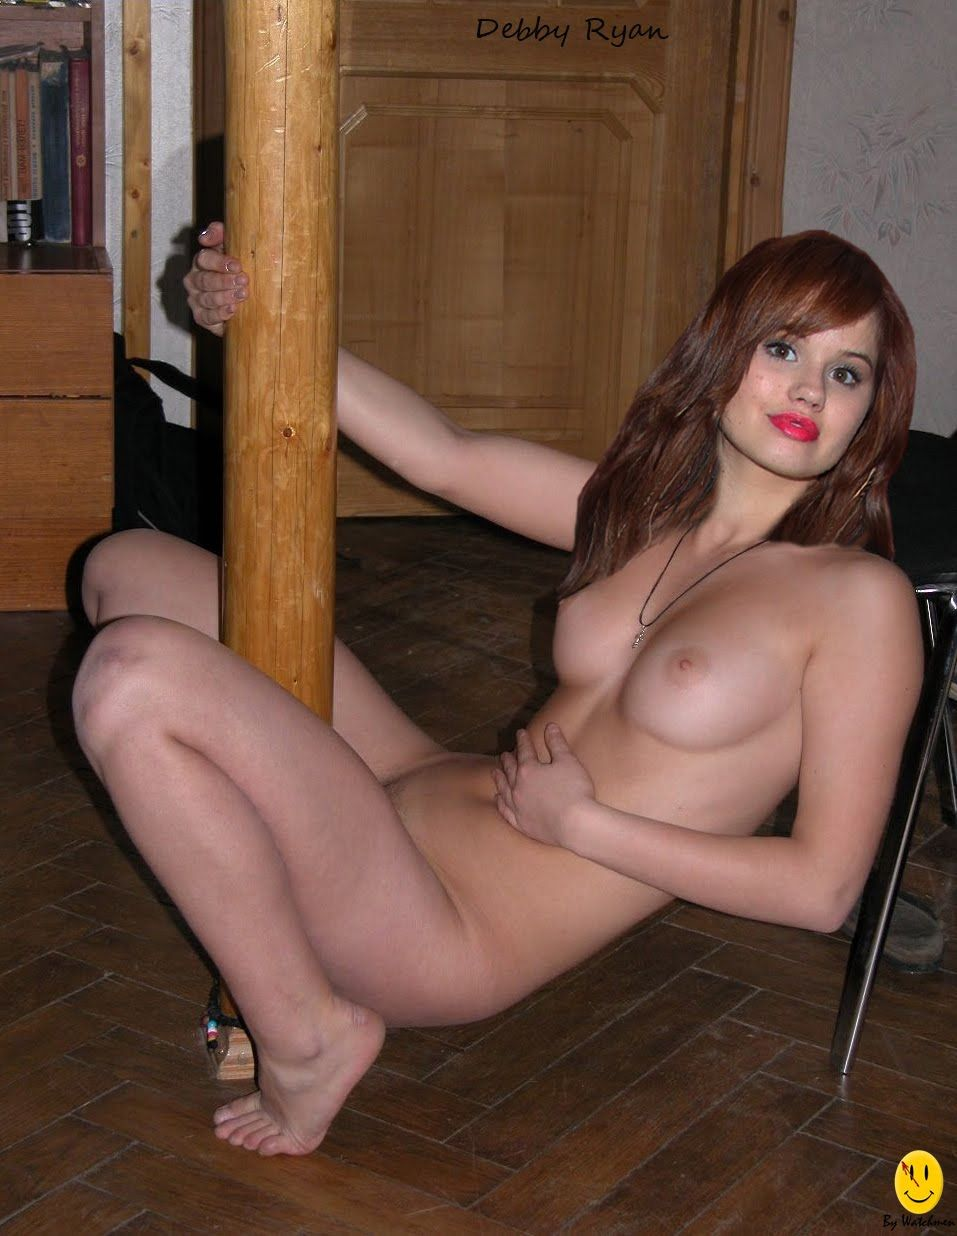 Debby ryan nudes finger herself